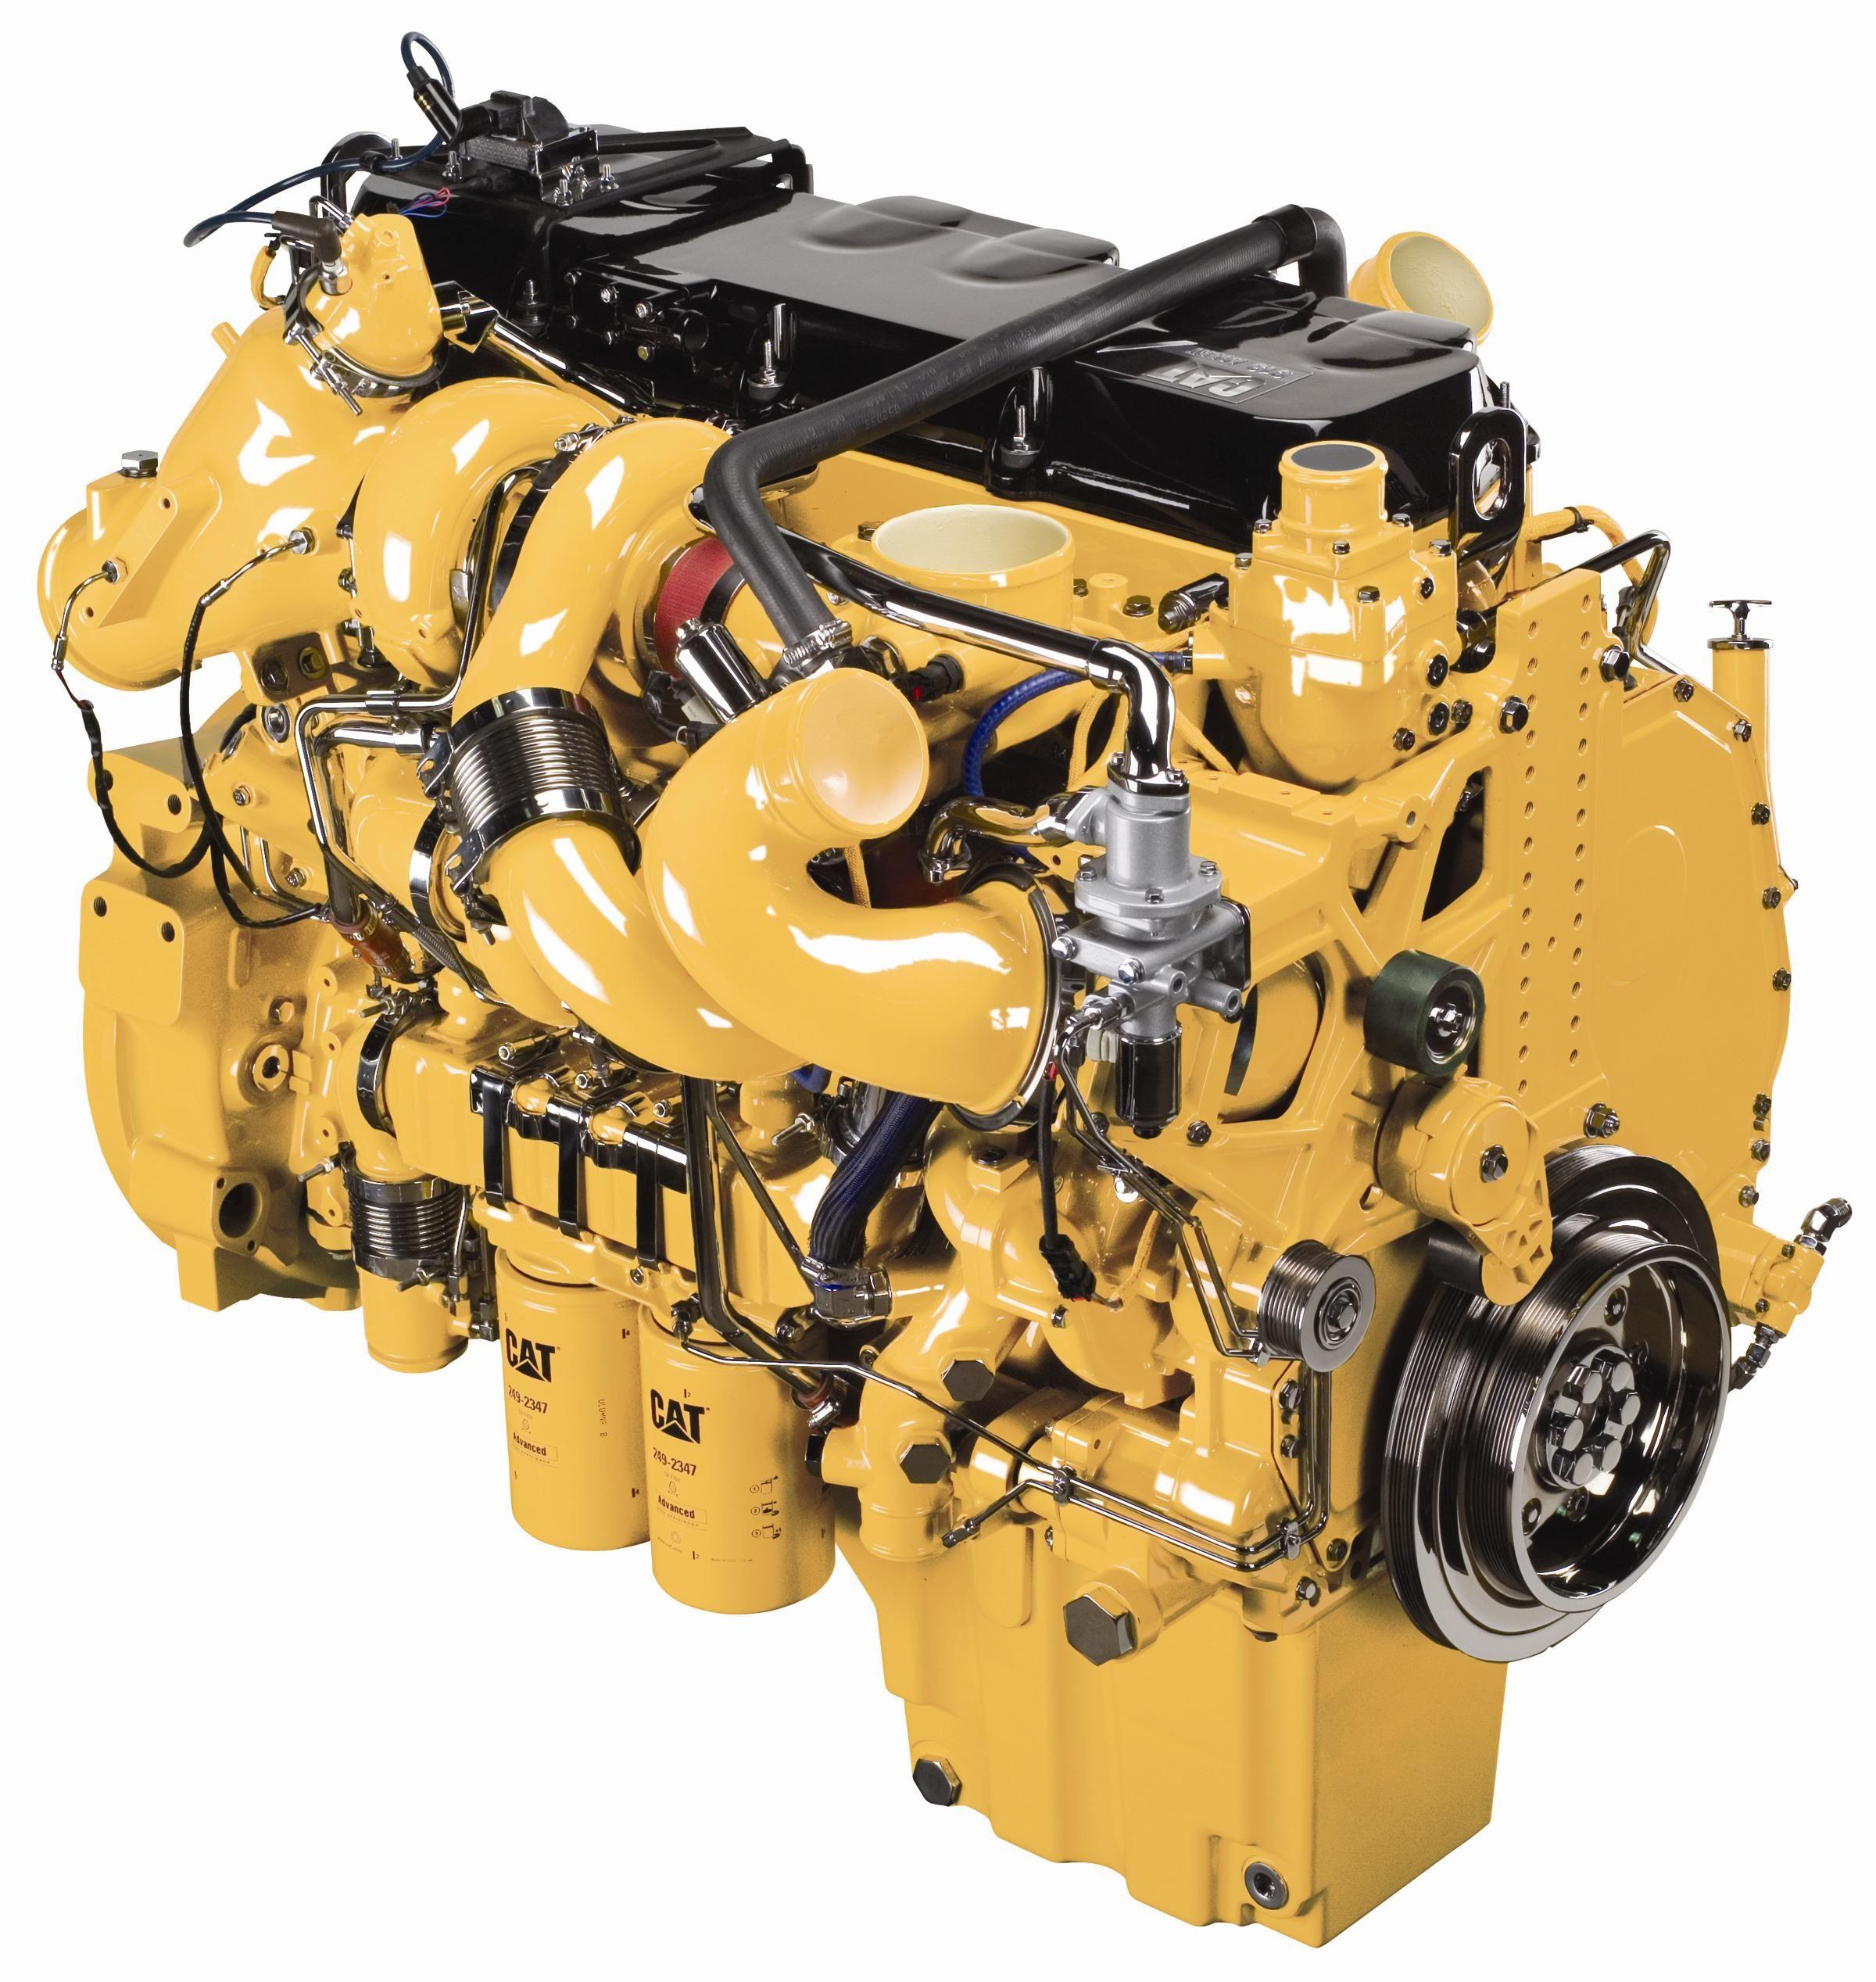 Pin by Black eagle on Diesels (Heavy Duty) | Truck engine